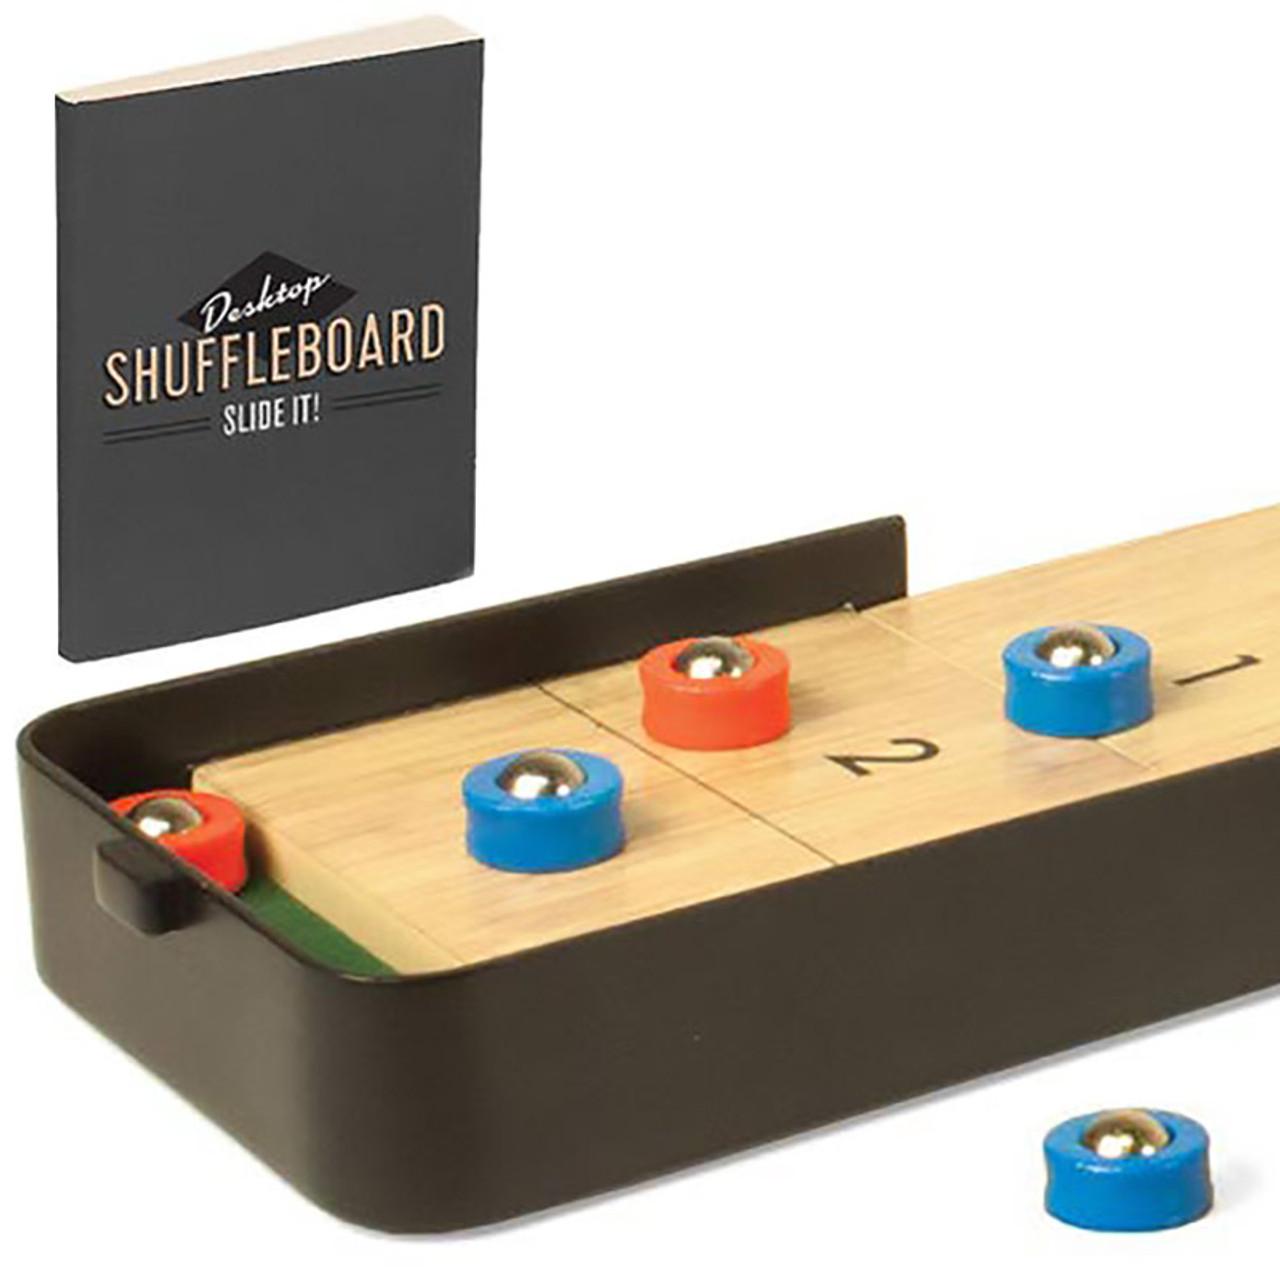 Desktop Shuffleboard Game